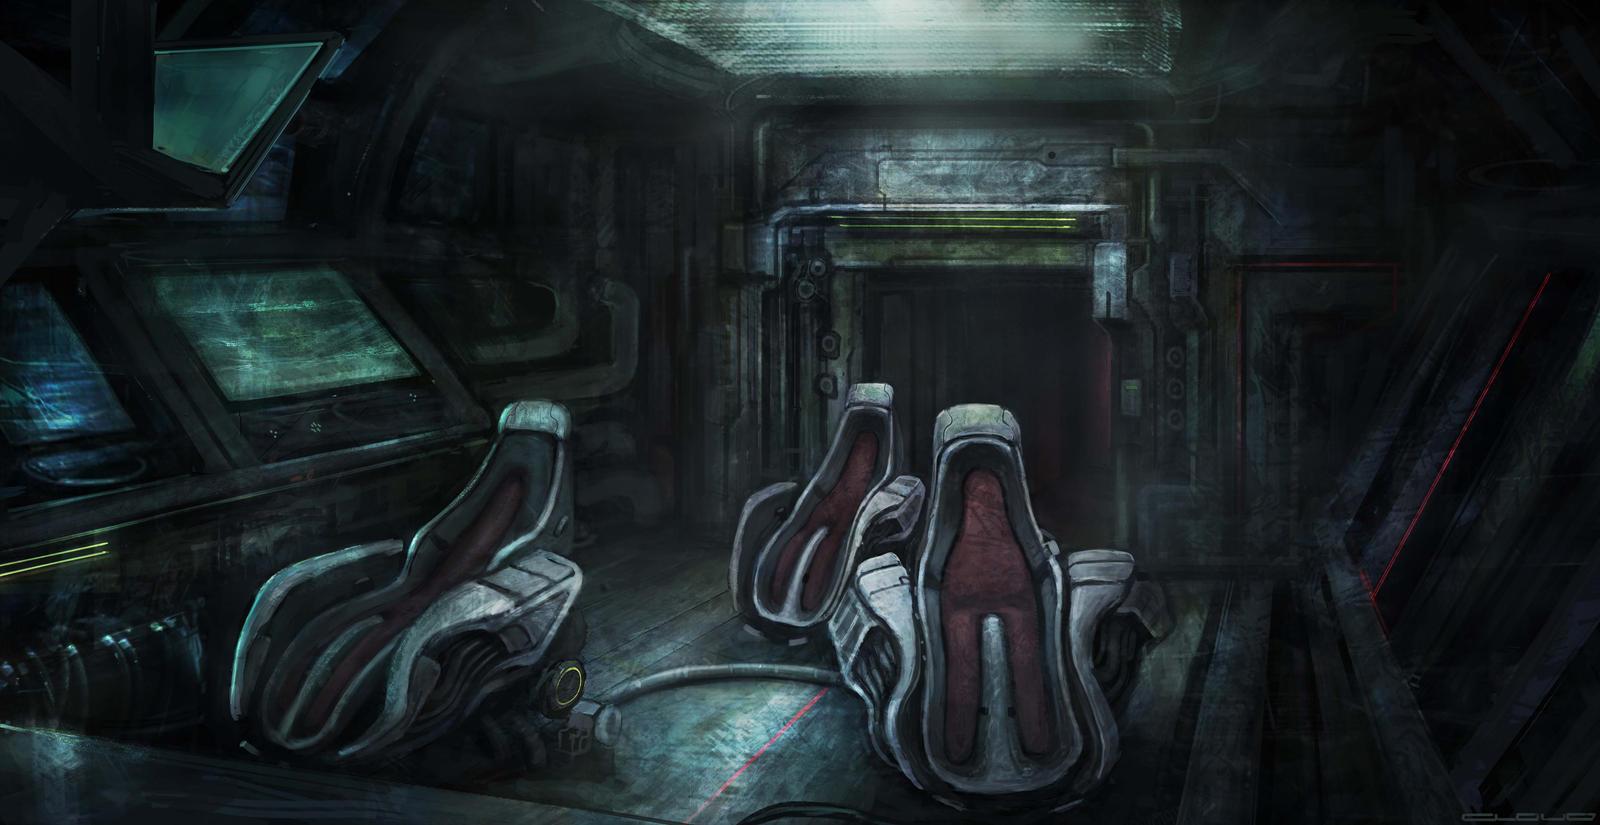 Cockpit concept by Darkcloud013